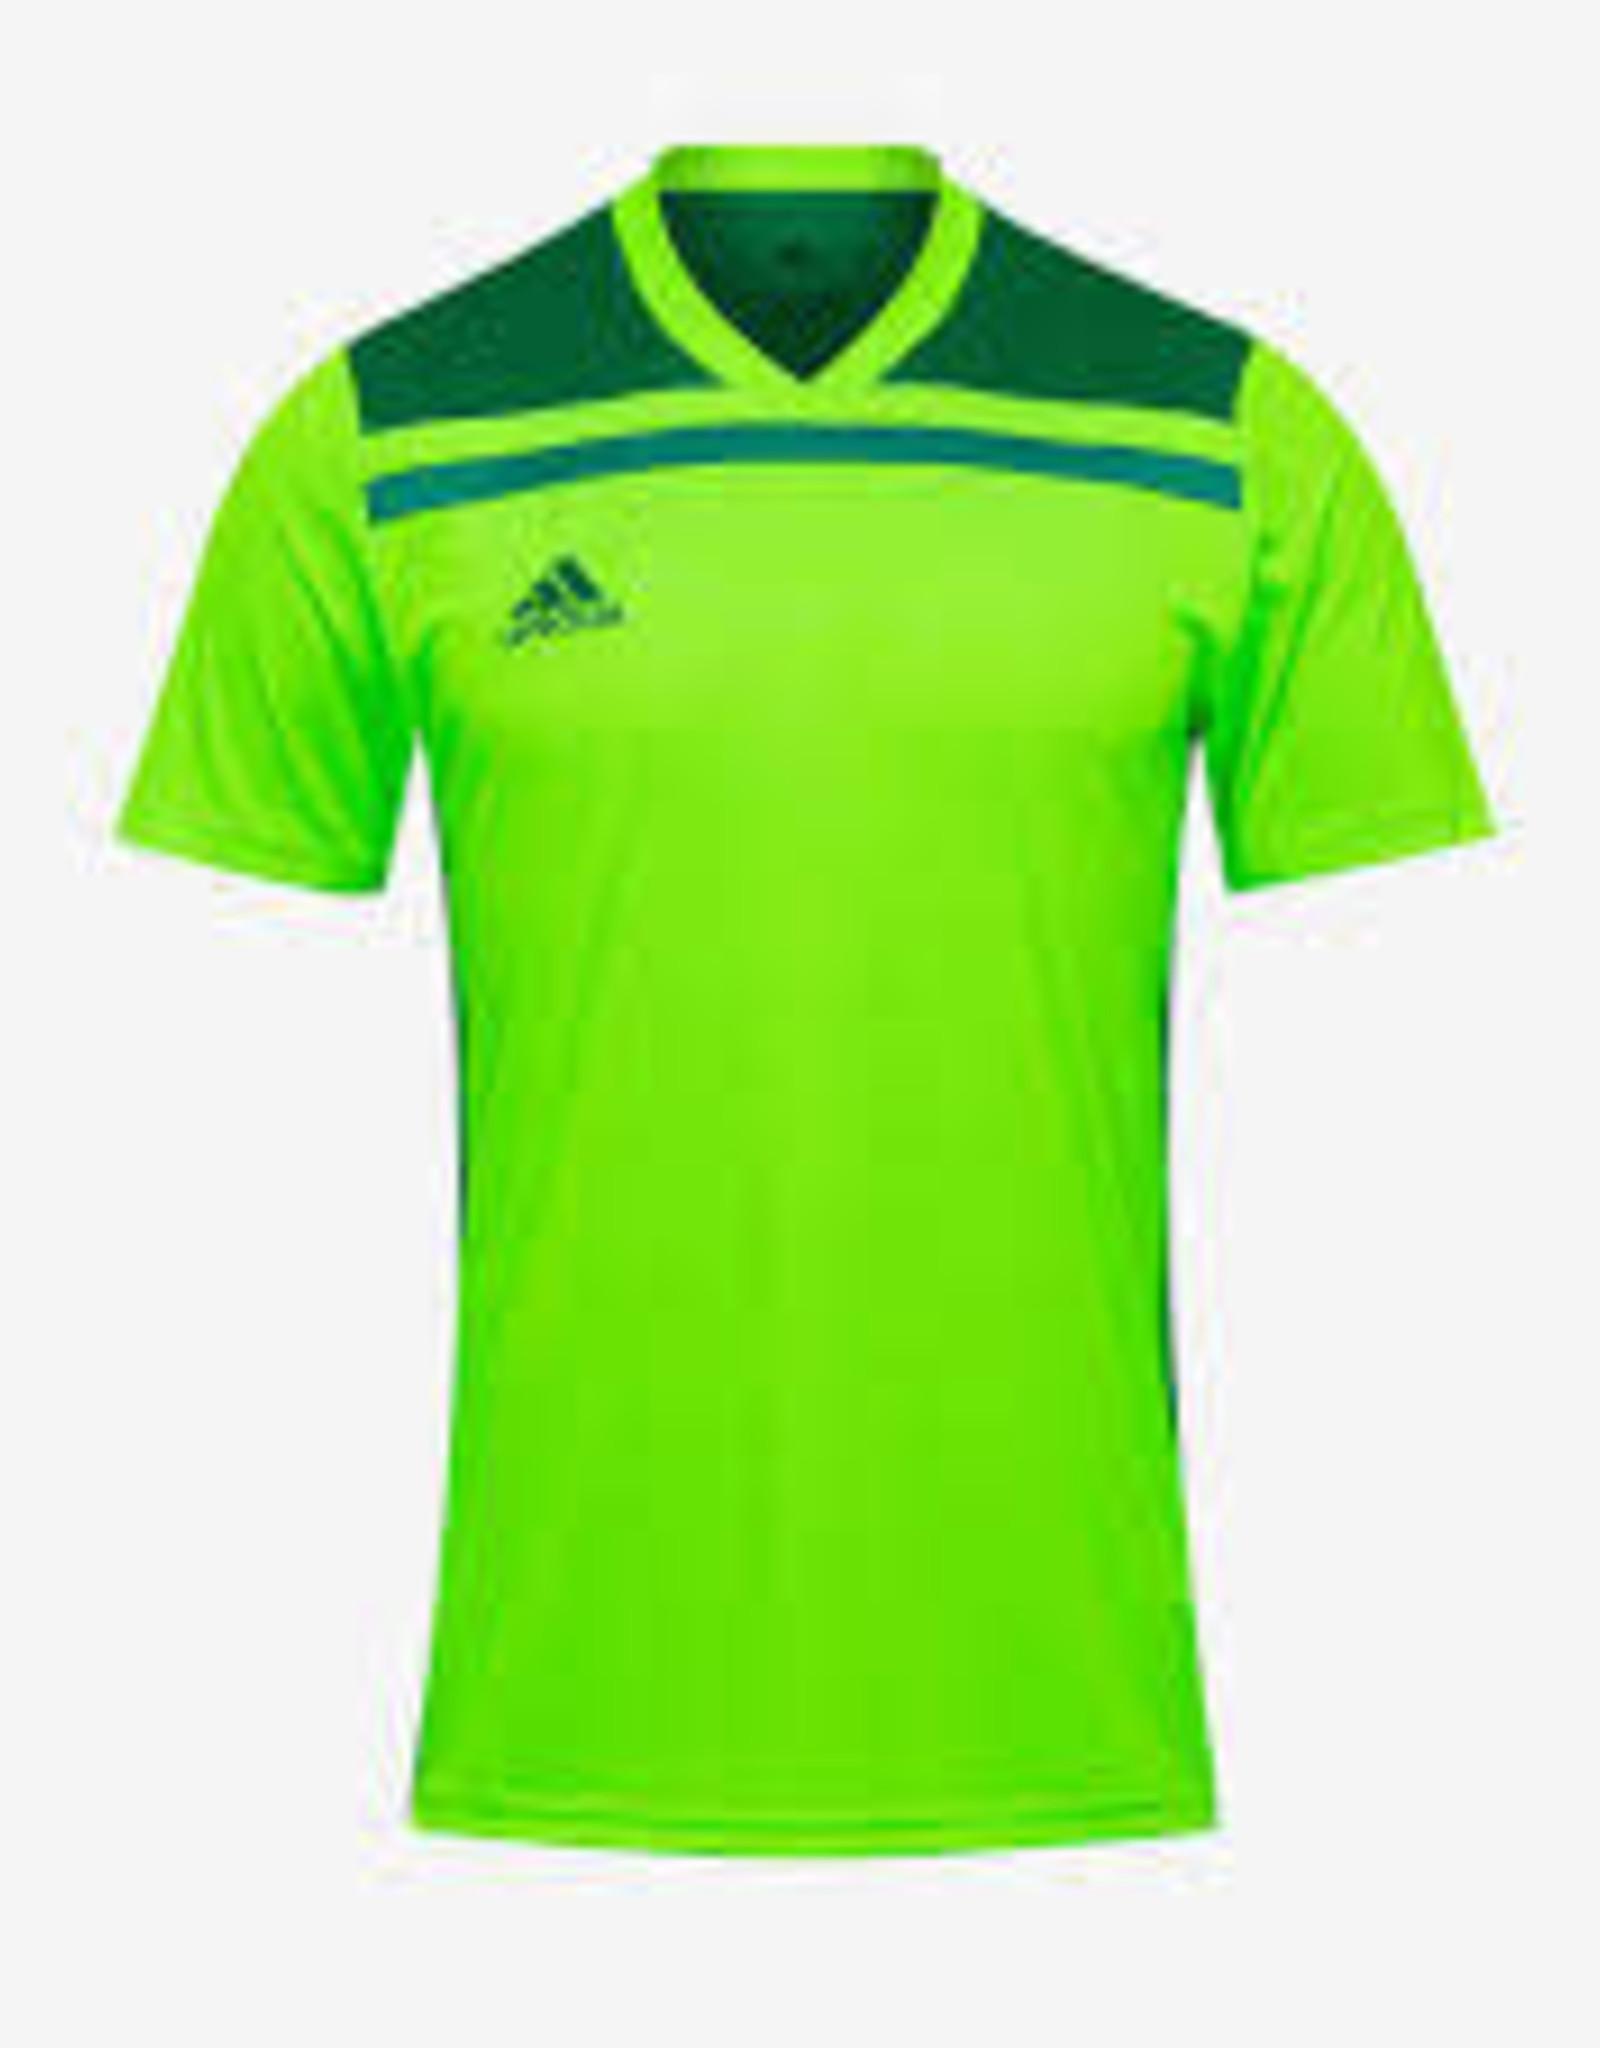 Adidas Tshirt Groen